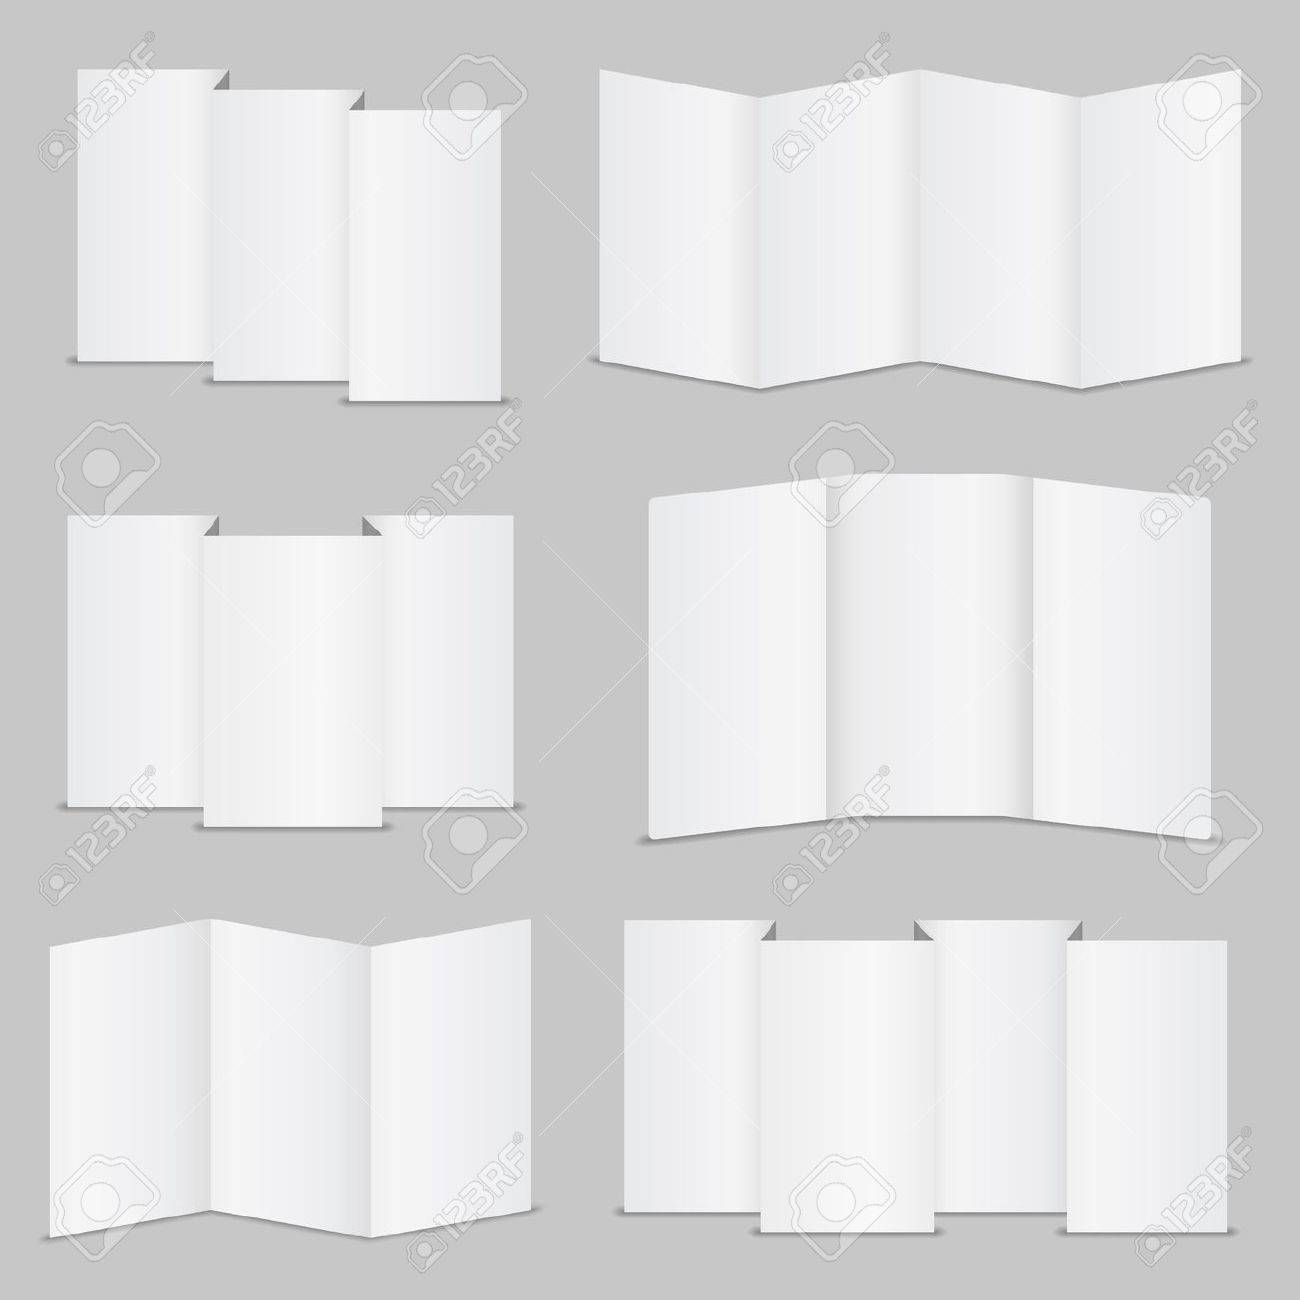 Brochure Templates Stock Vector - 13024592